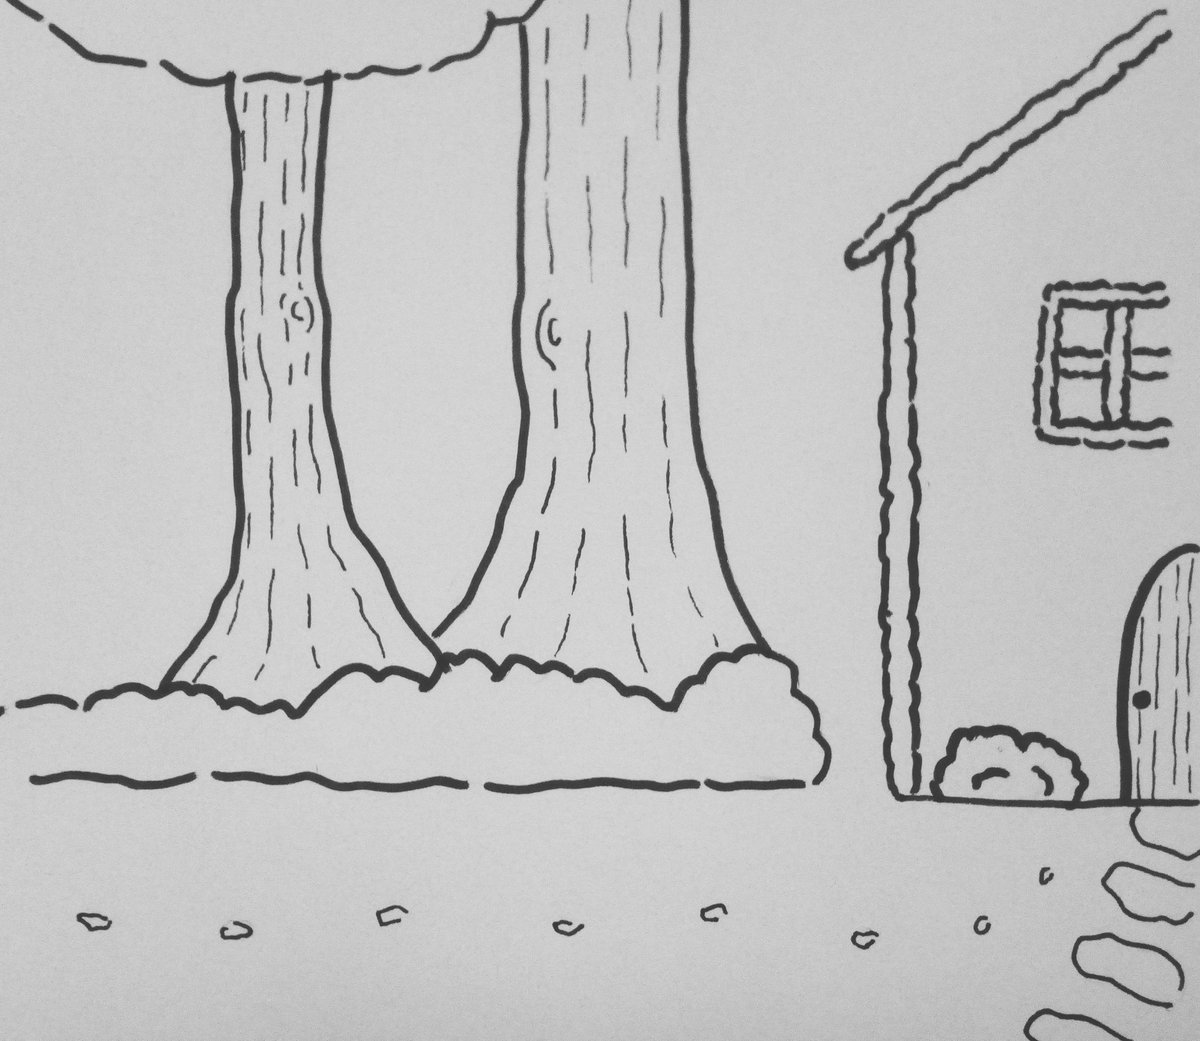 #inktober day 22 Trail #inktober2017 #illustration #sketch #drawing #art #artist #pen #trail #hanselandgretel #candyhouse #grimmbrothers<br>http://pic.twitter.com/rLXE3rDWvU